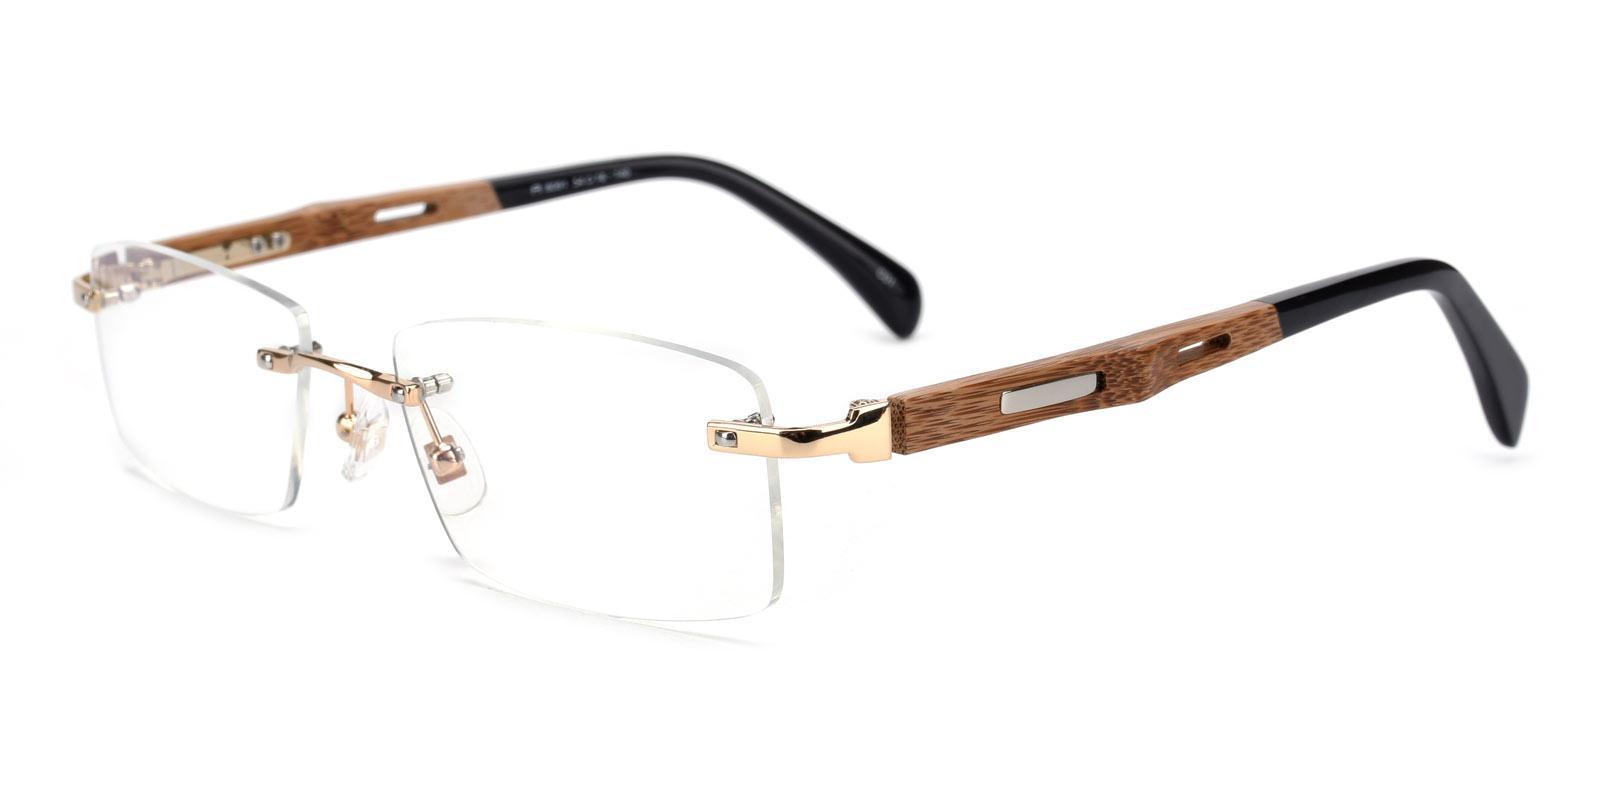 Panda-Gold-Rectangle-Combination / Titanium-Eyeglasses-detail